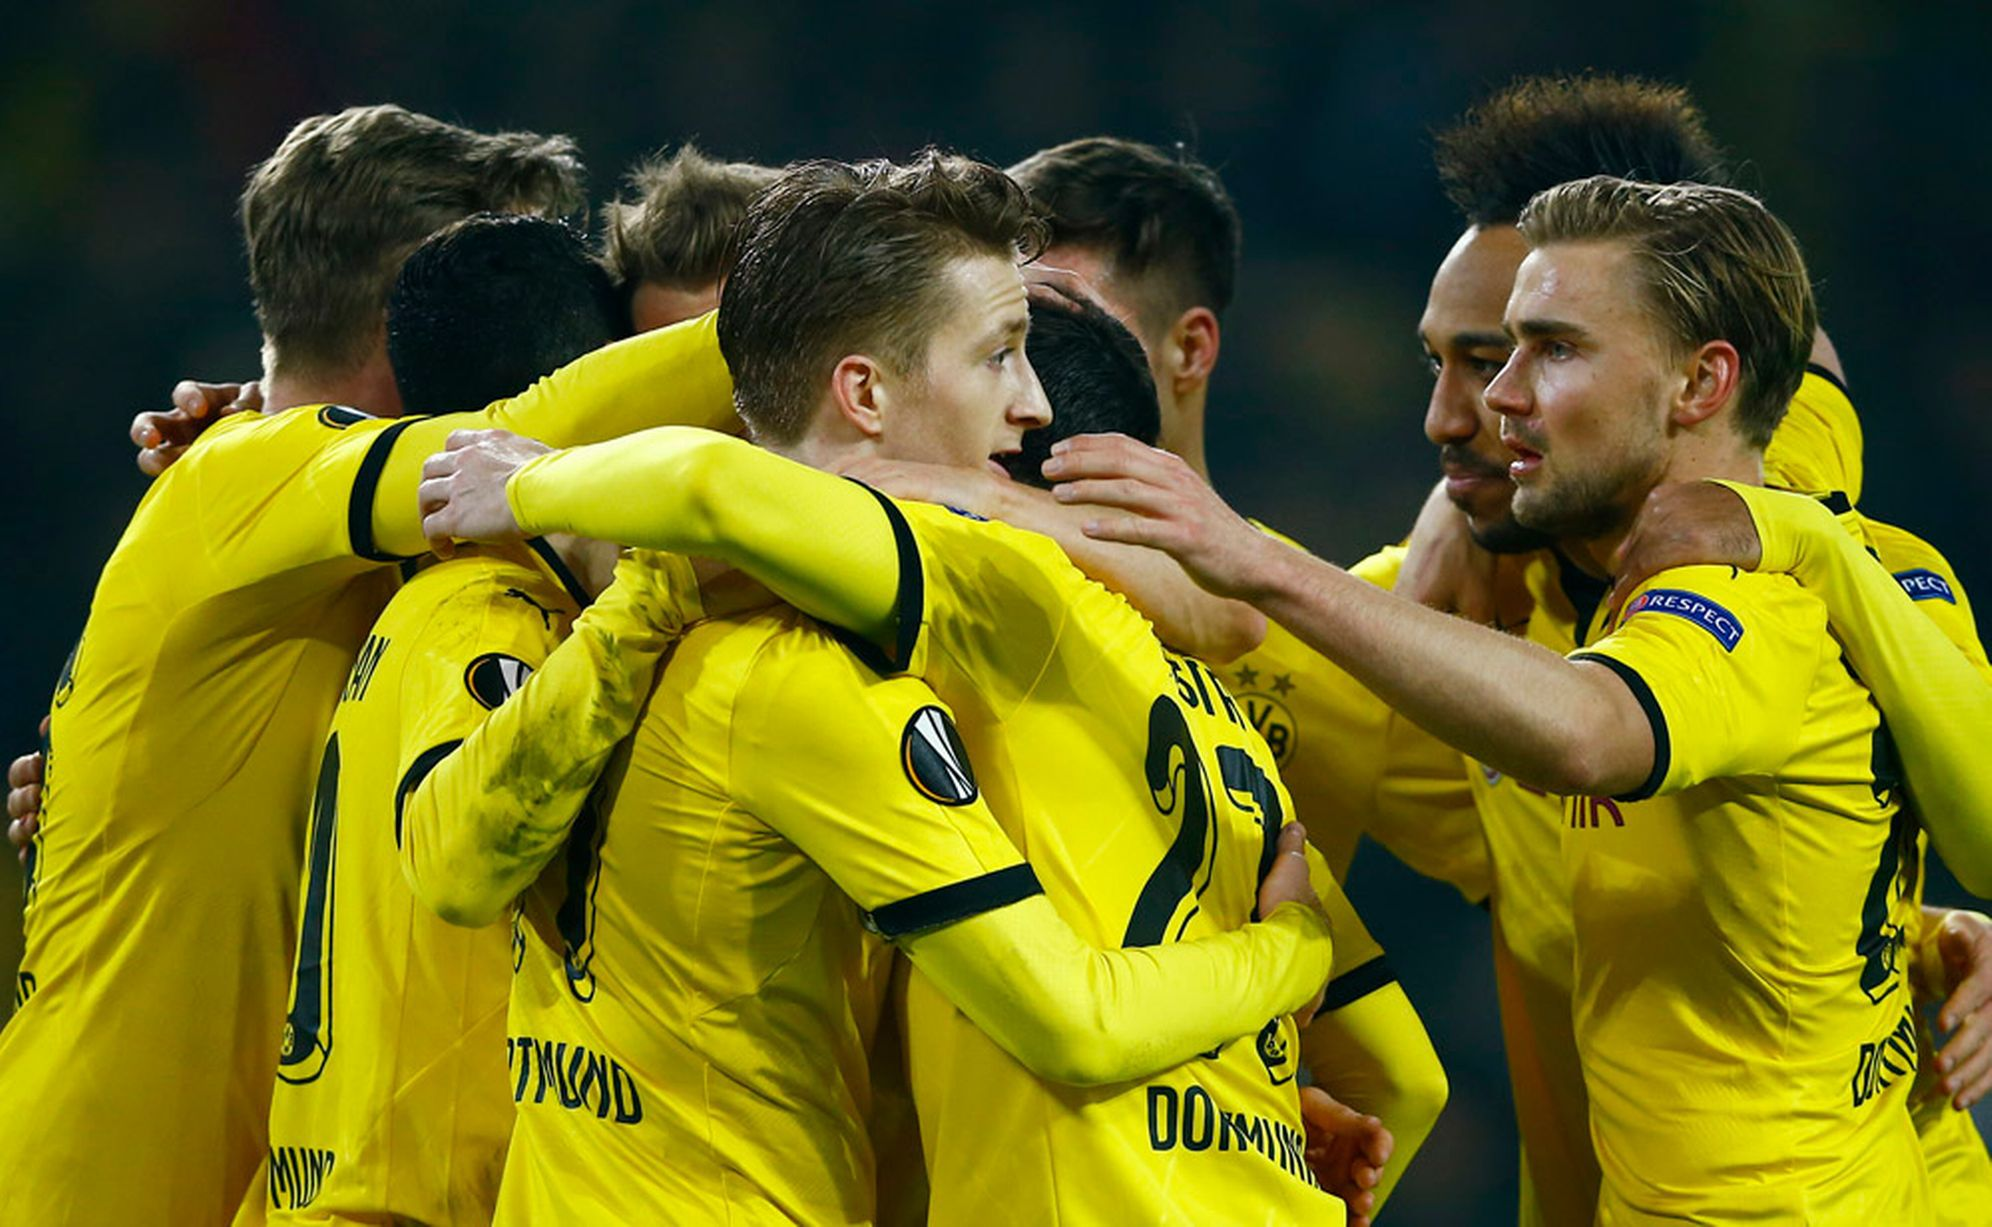 Borussia Dortmund Hd Wallpaper